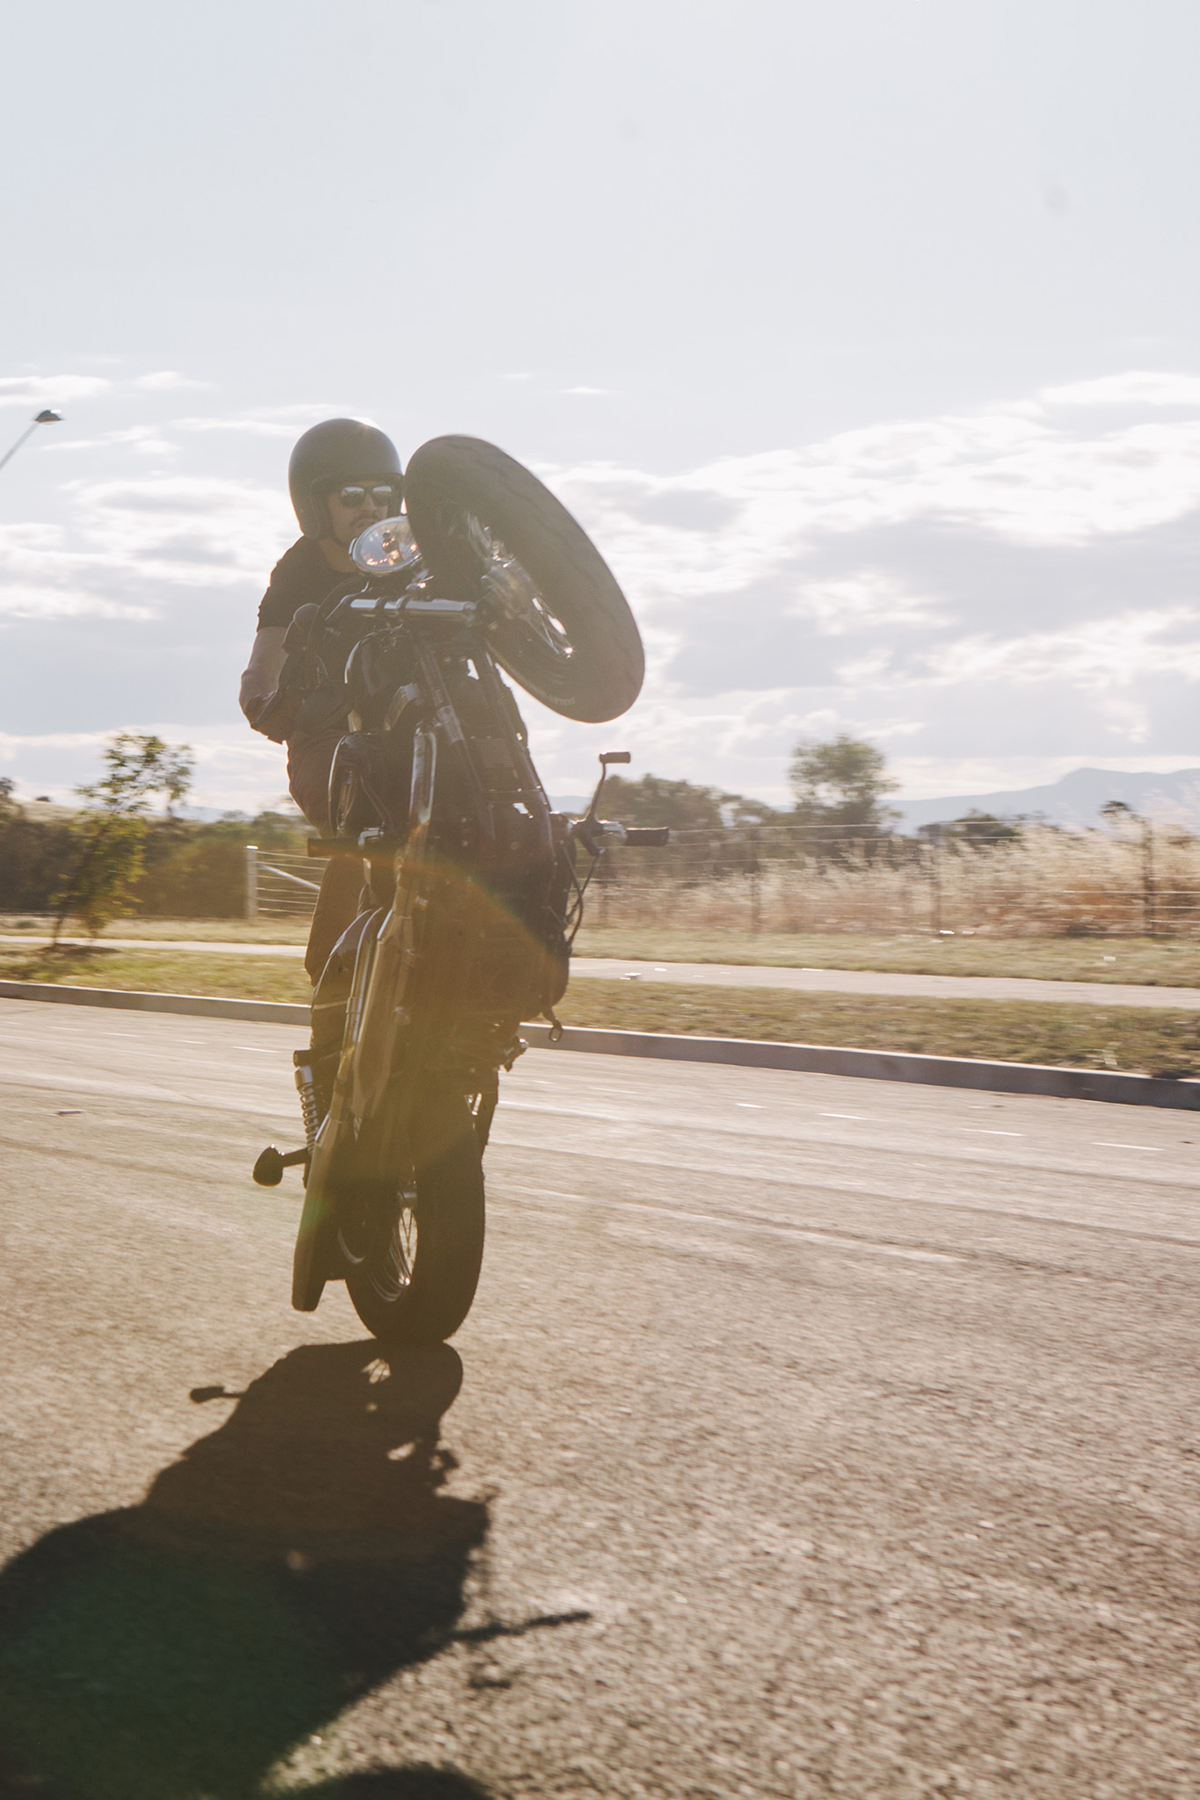 Ride_Till_Dead_Harley_Wheelie_Burnout20160706 (26)